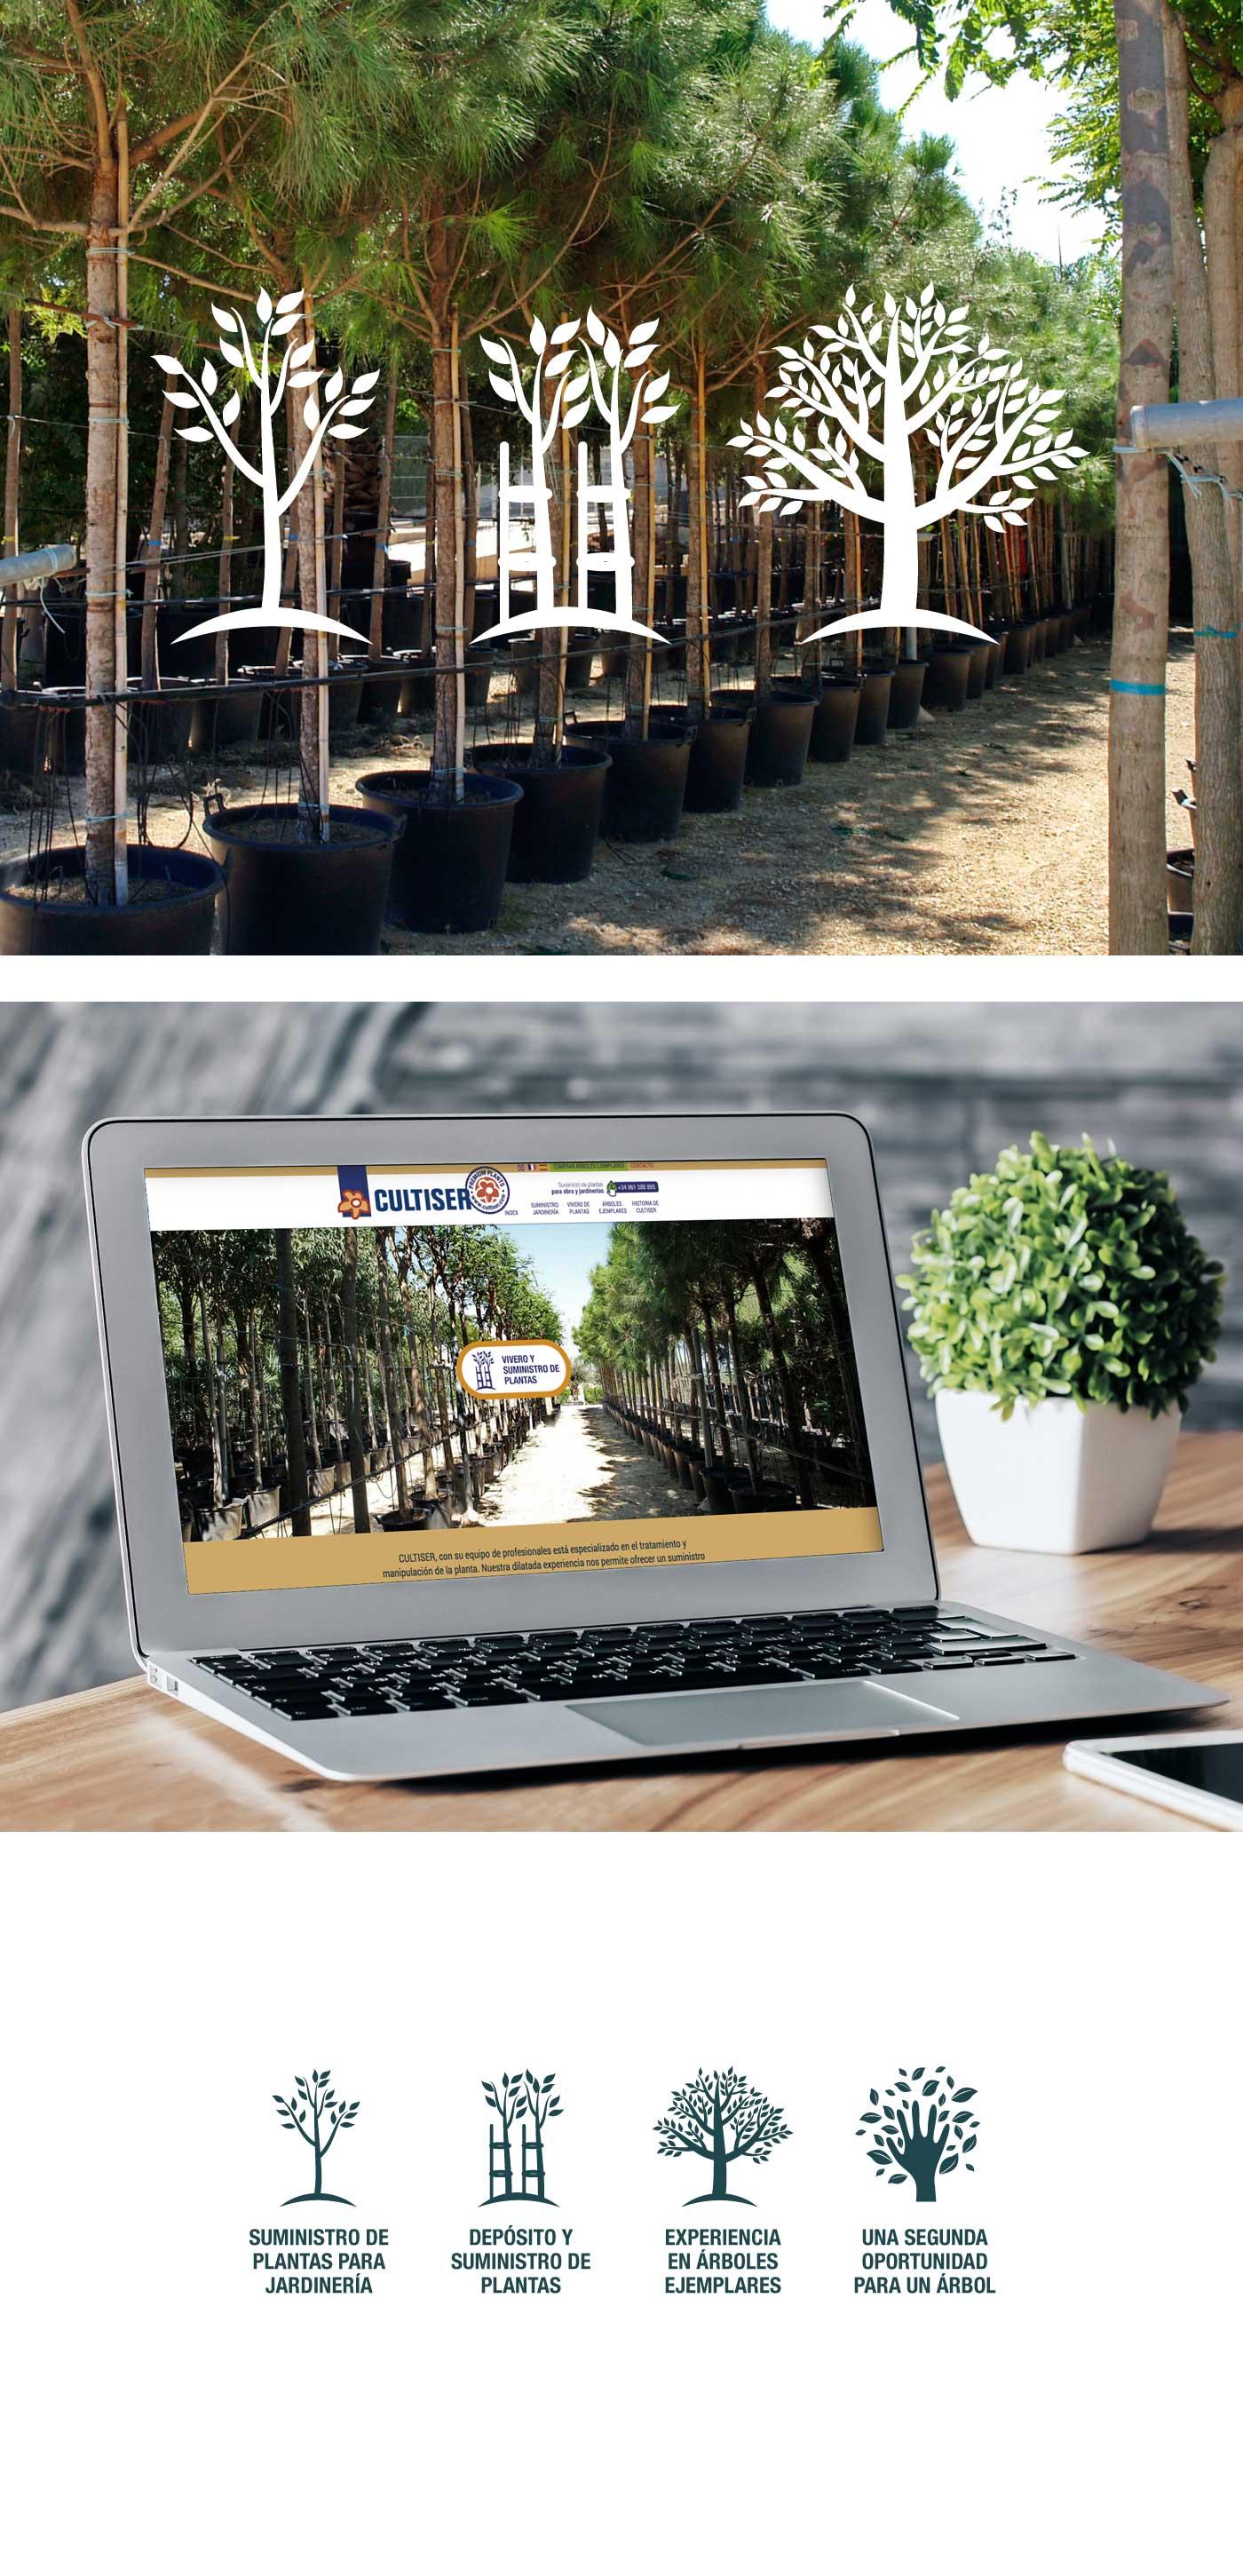 Diseño web responsive vivero valencia